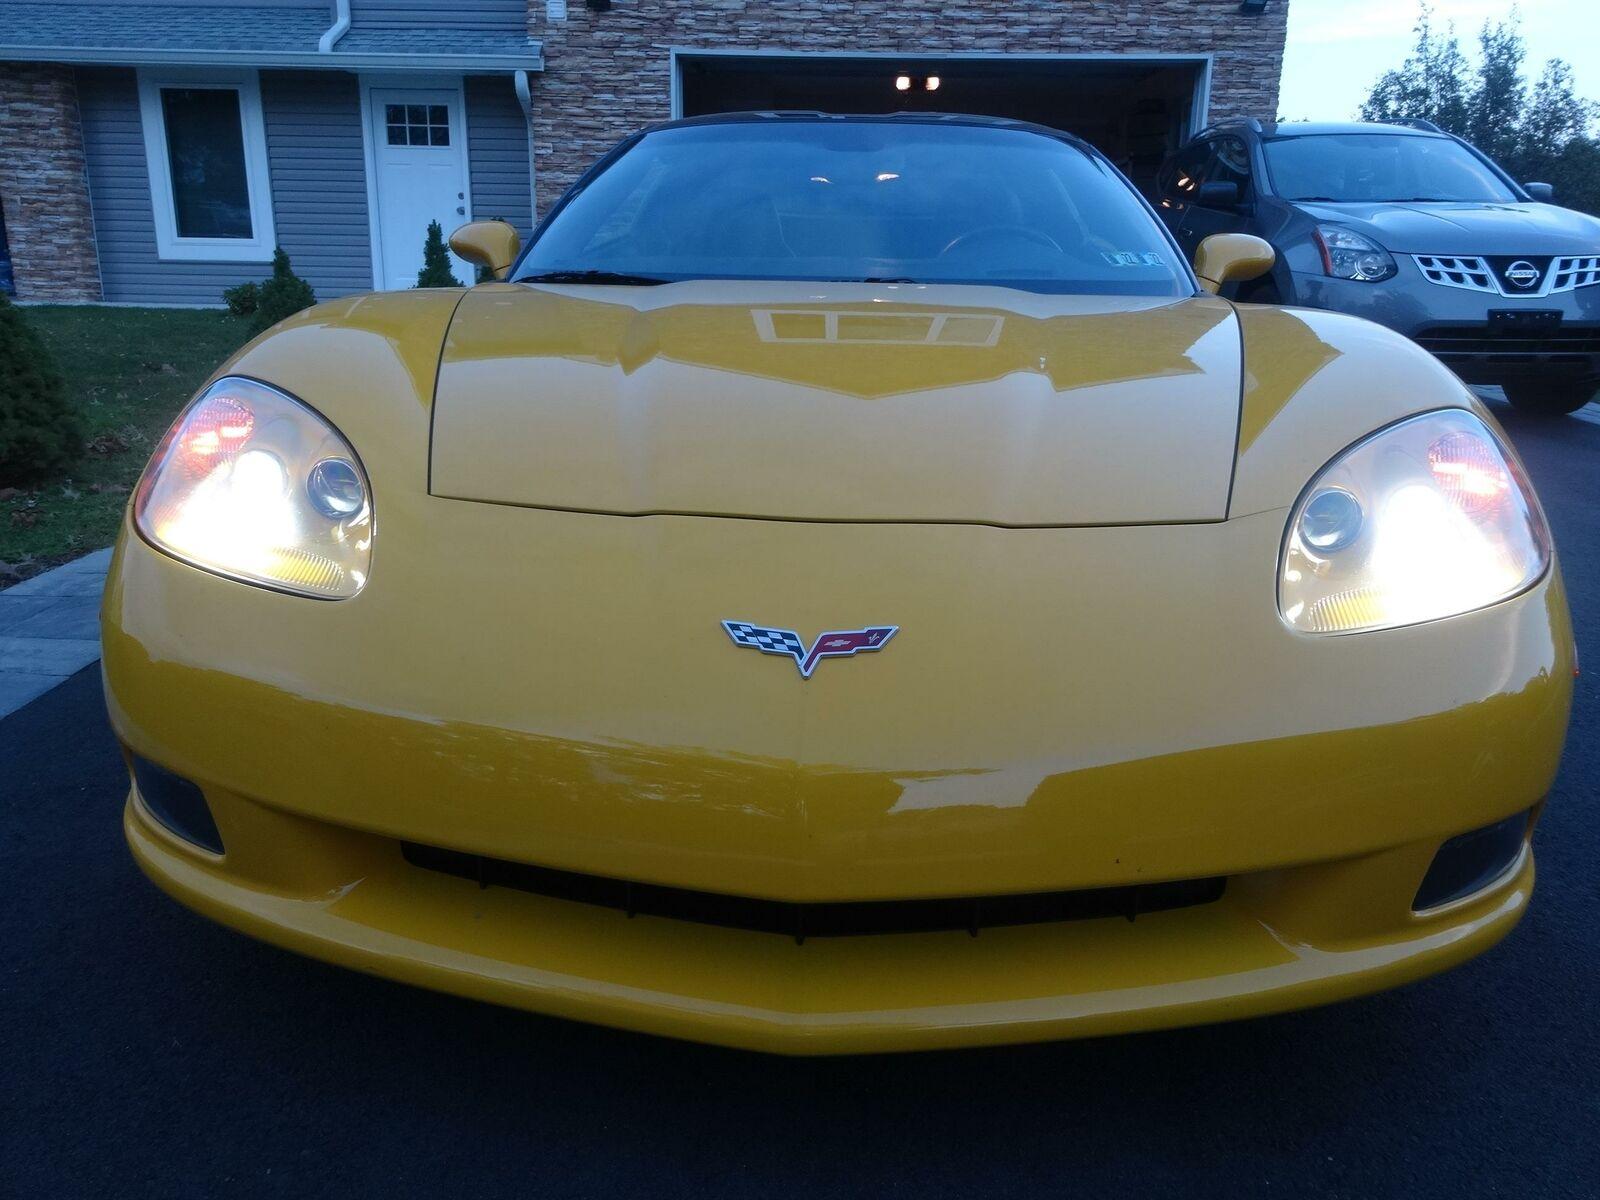 2005 Yellow Chevrolet Corvette     C6 Corvette Photo 5